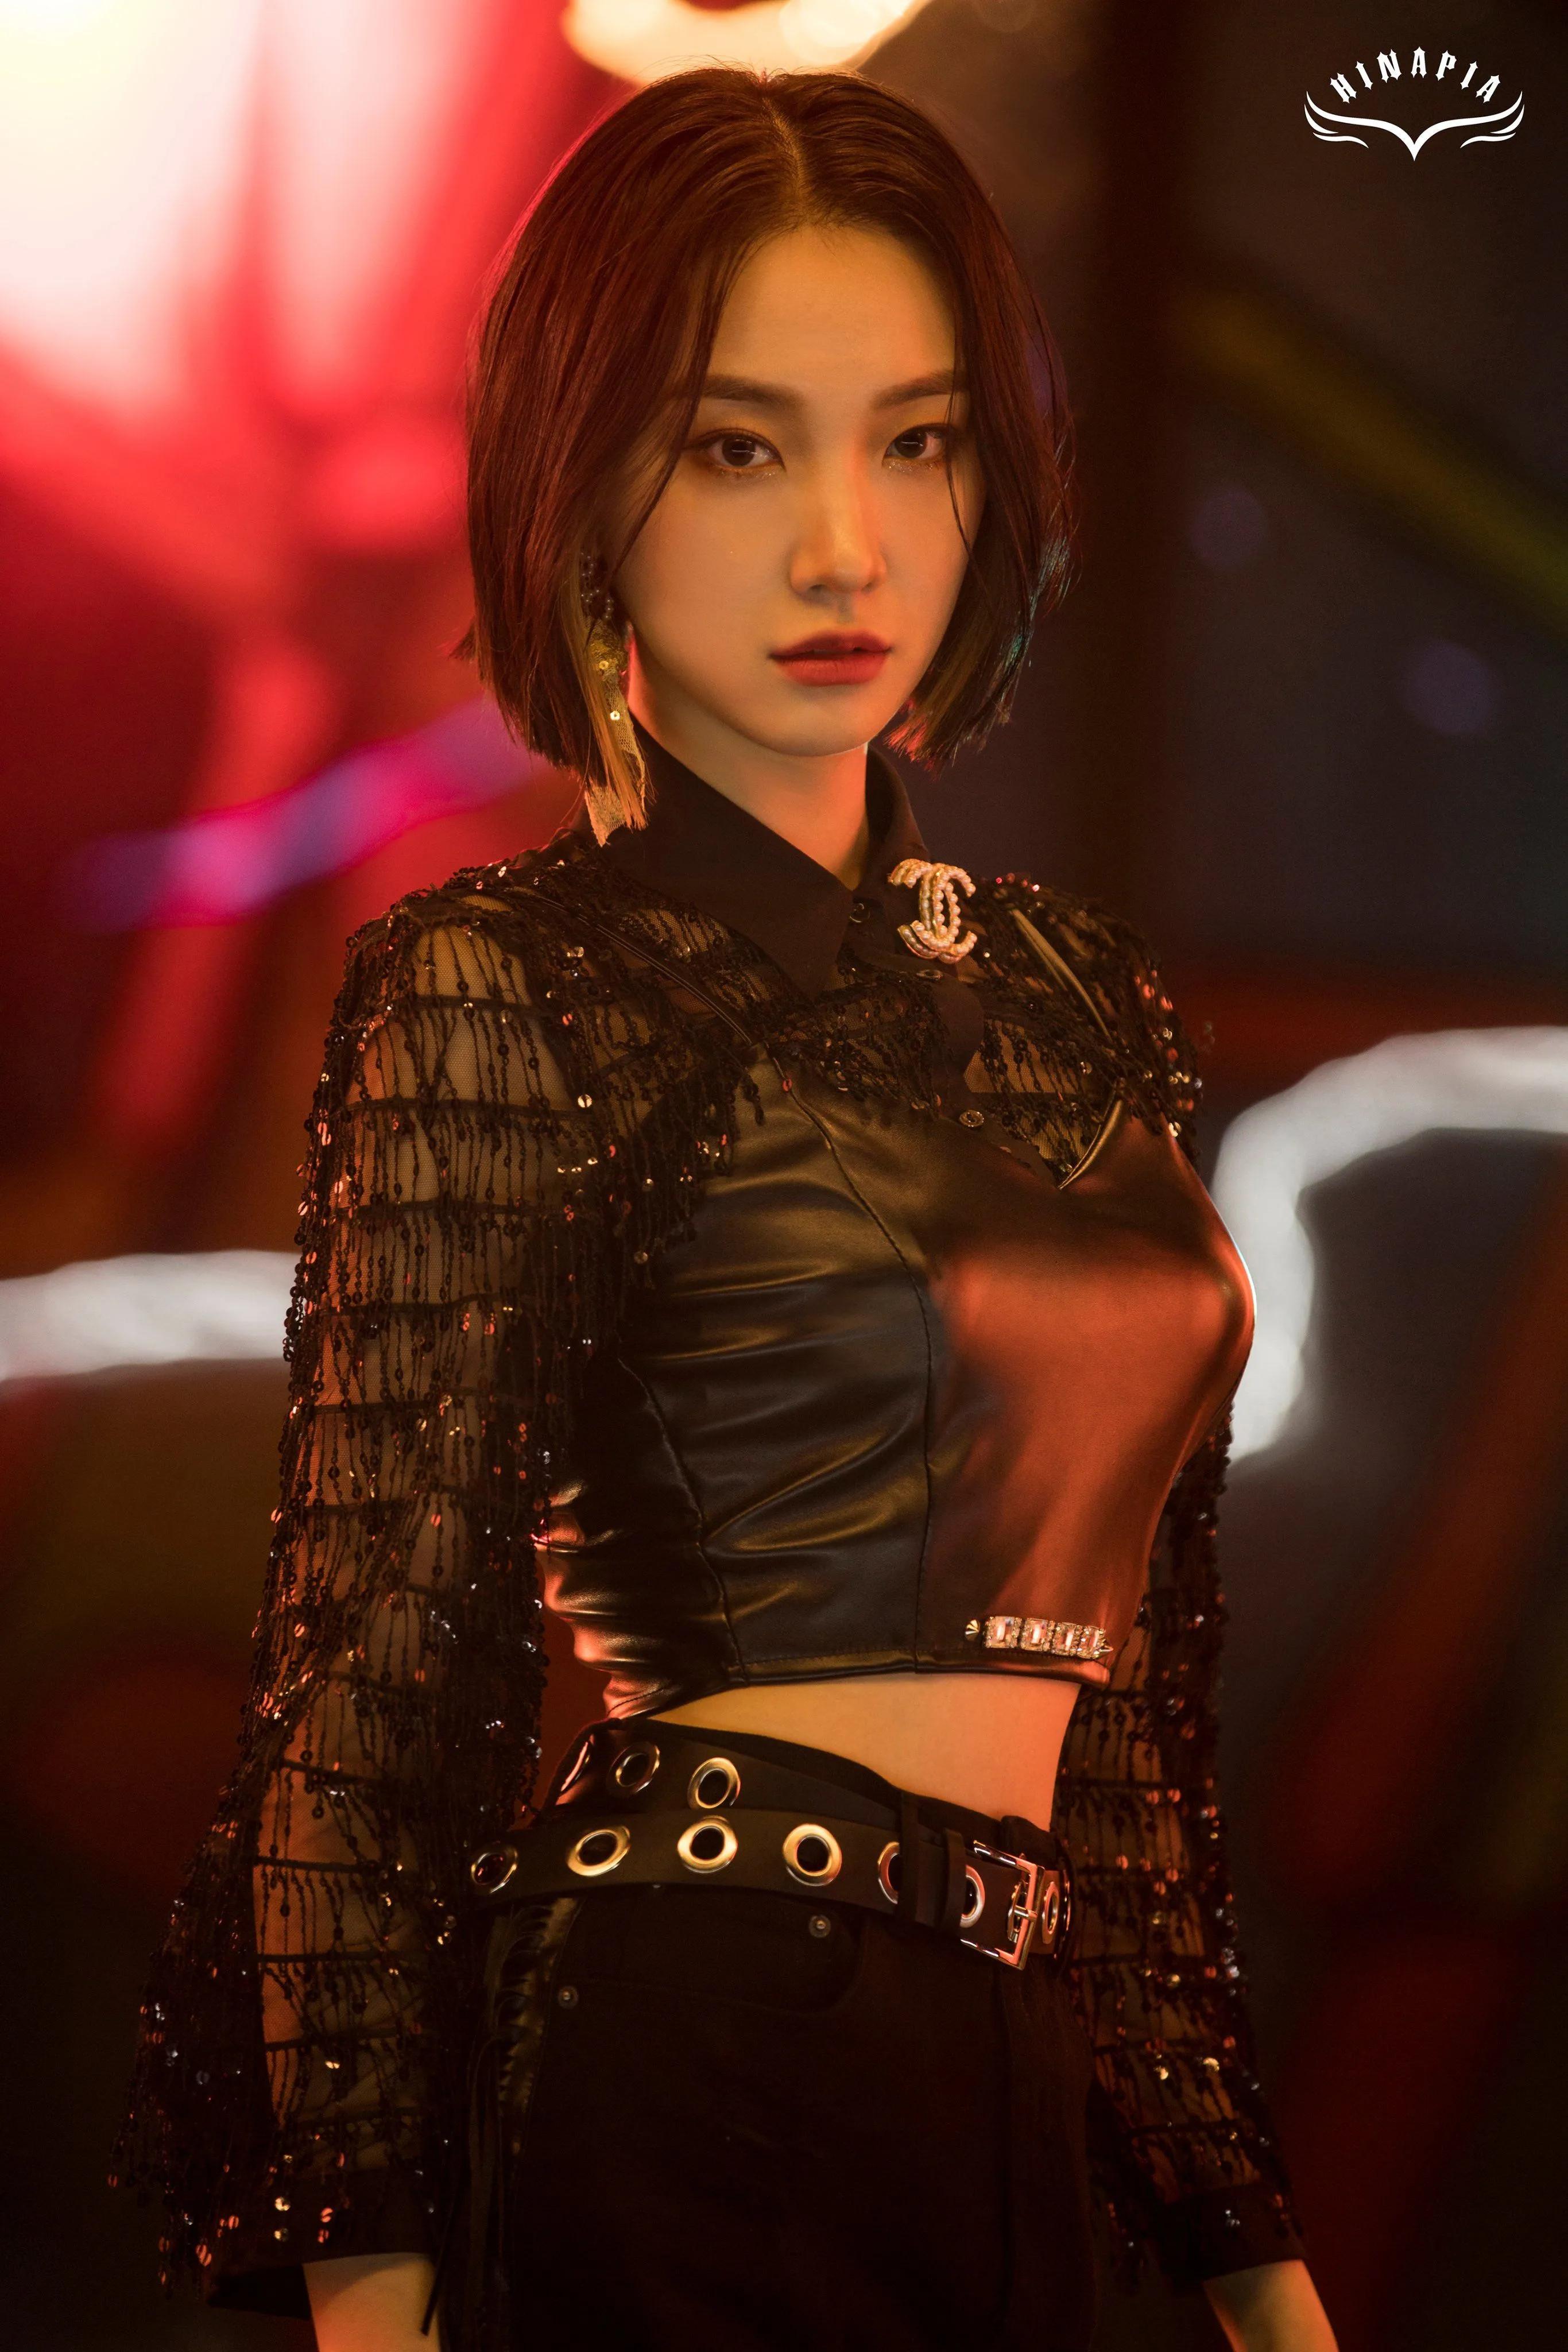 HINAPIA - New Start 1st Digital Single teasers   Kpopping